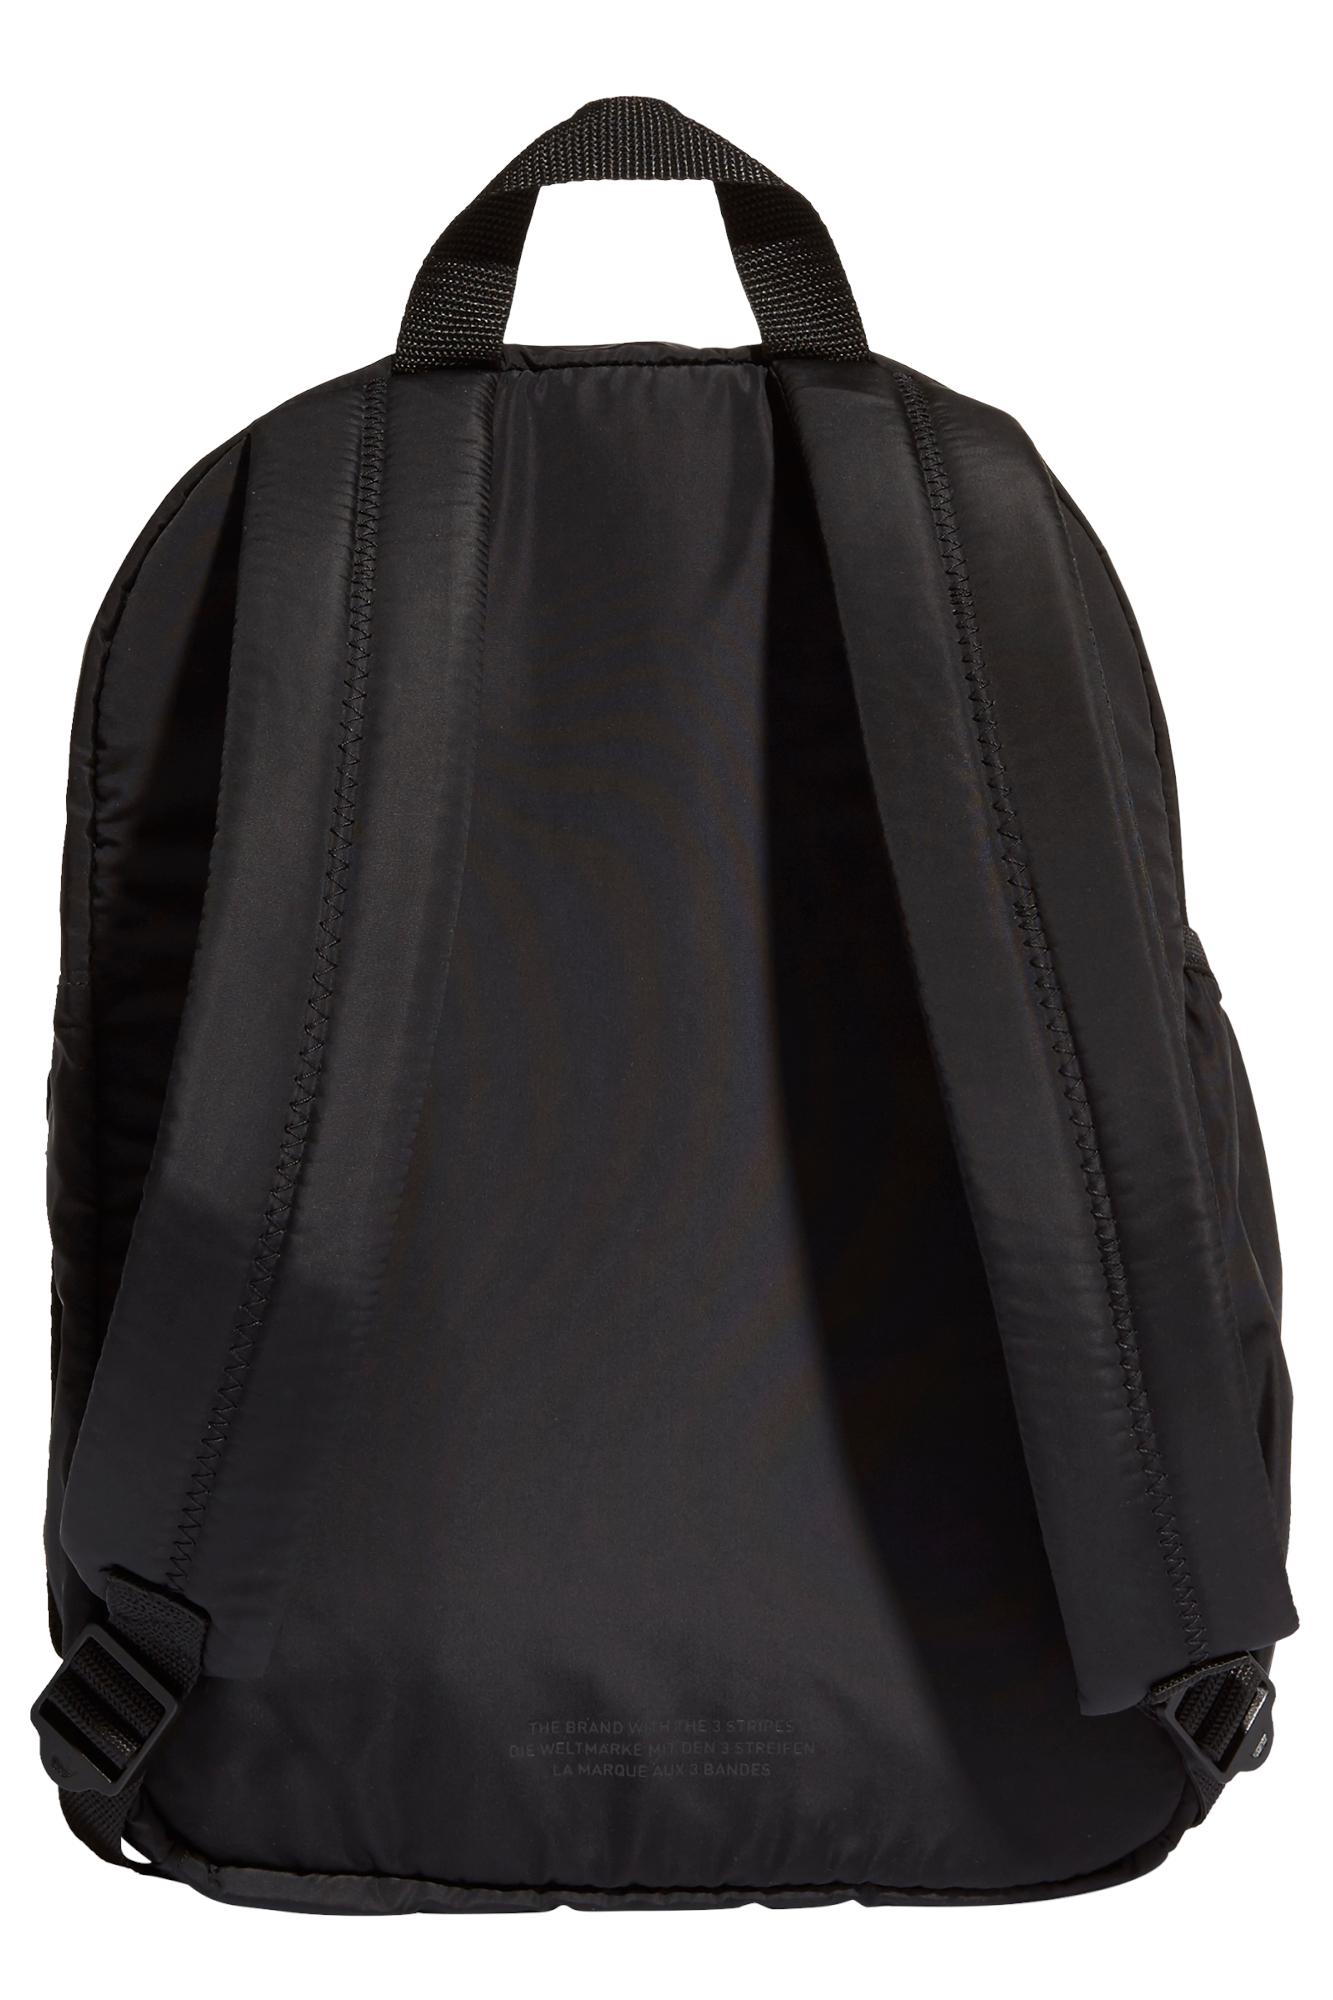 f0fb5917484da Plecak adidas Originals Classic Medium - DV0214 / Plecaki ...